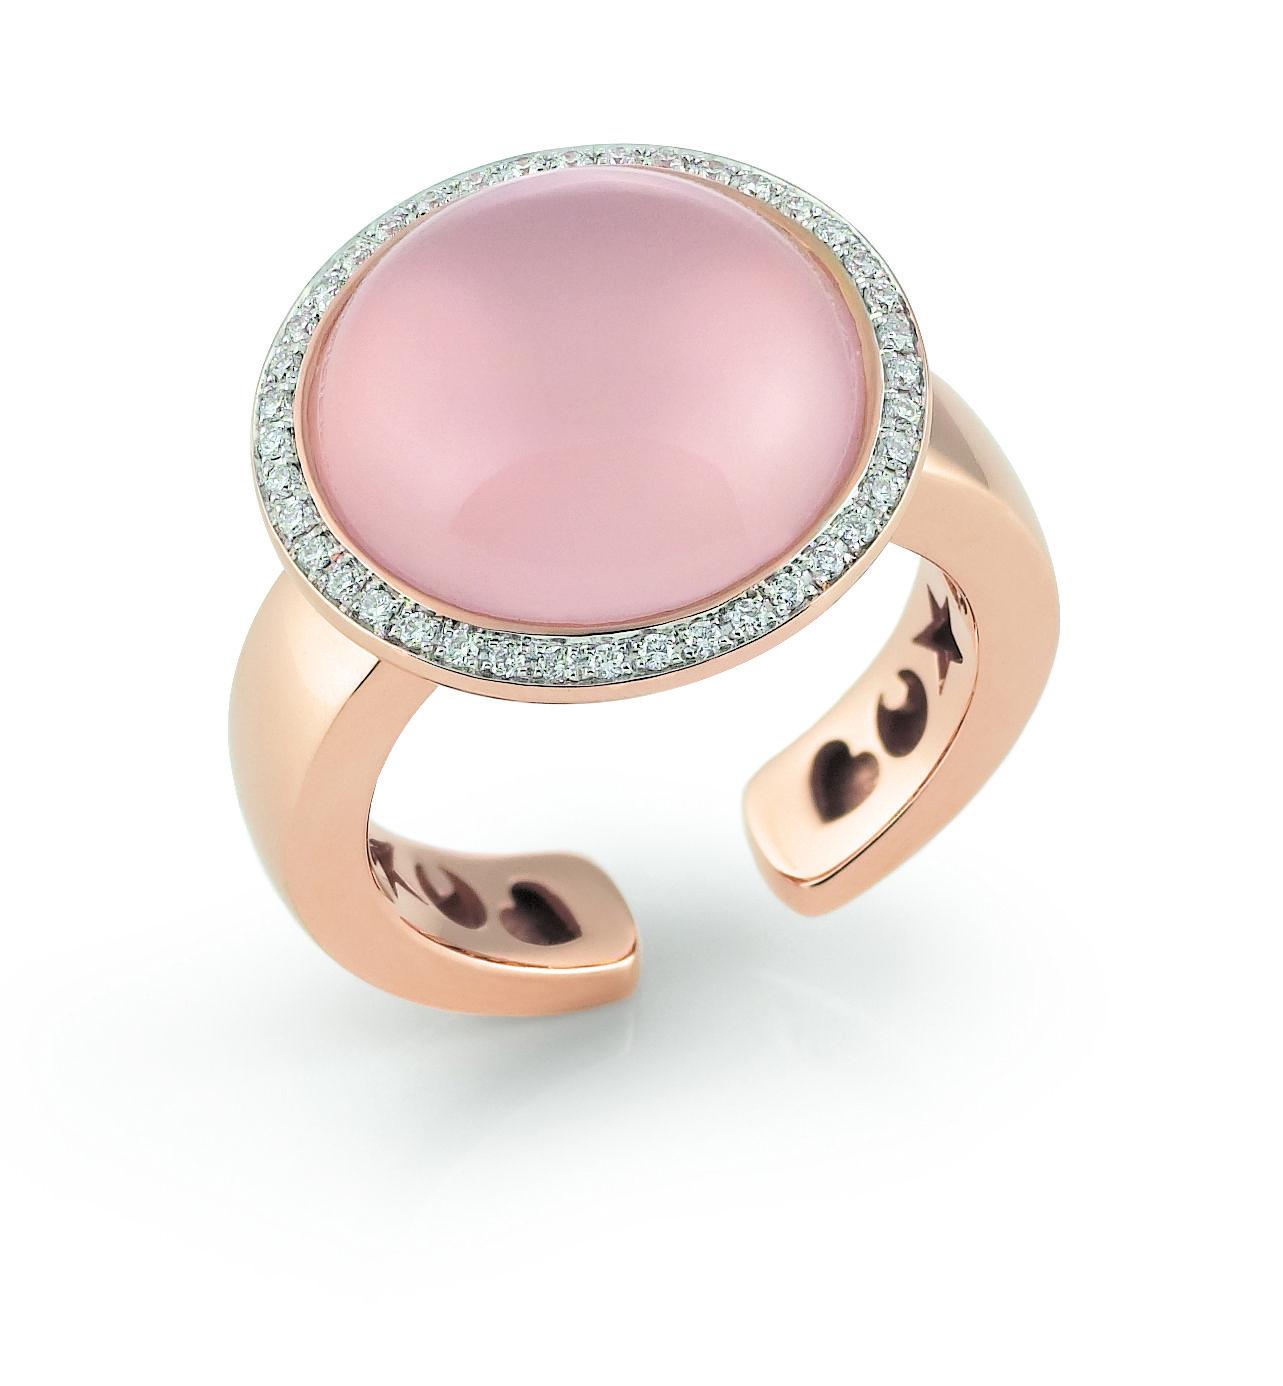 Al Coro ring   wardrobe wishes   Pinterest   Ring and Wardrobes